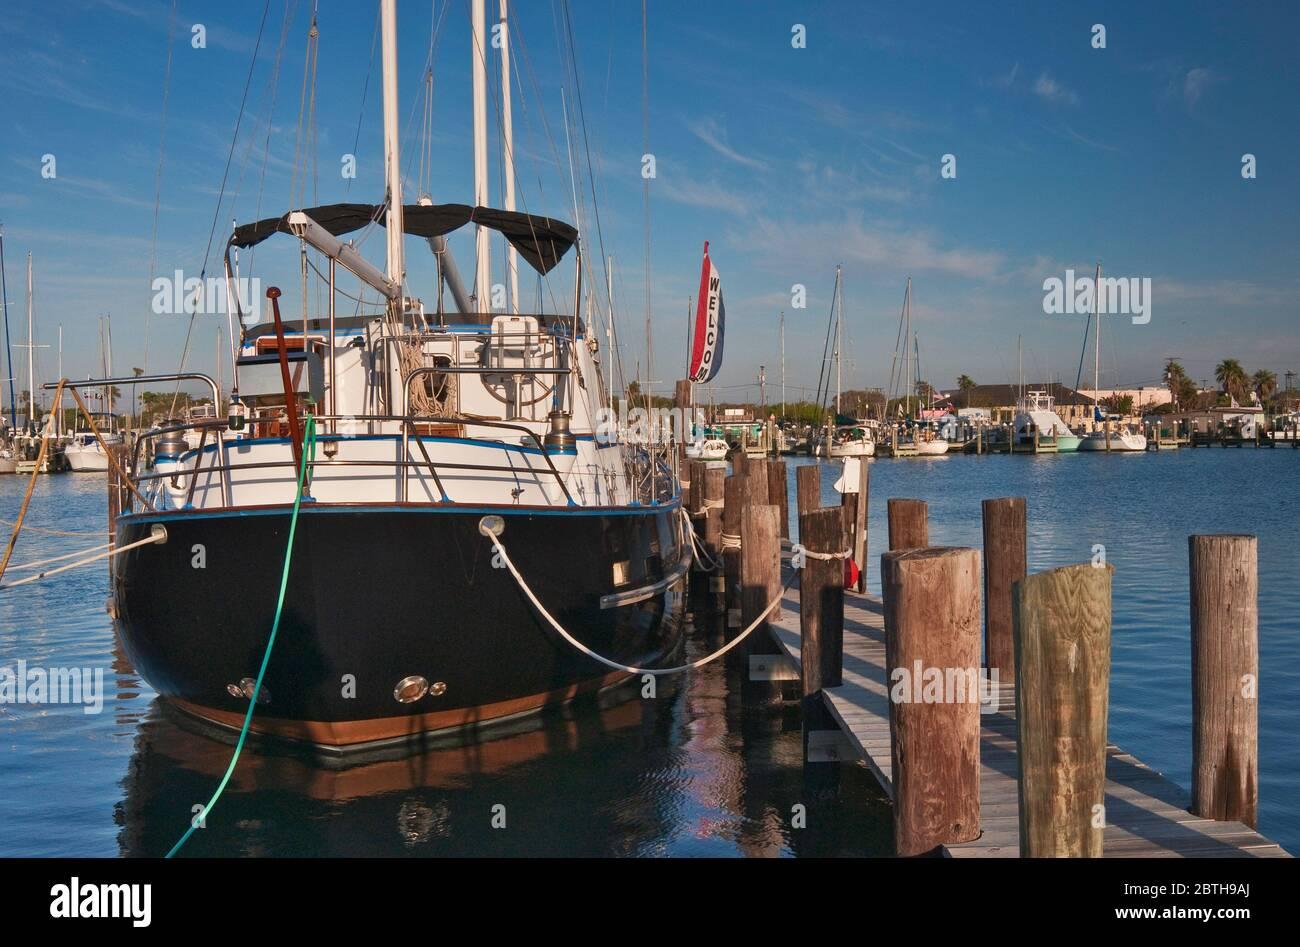 Casino cruise rockport tx deep sea fishing